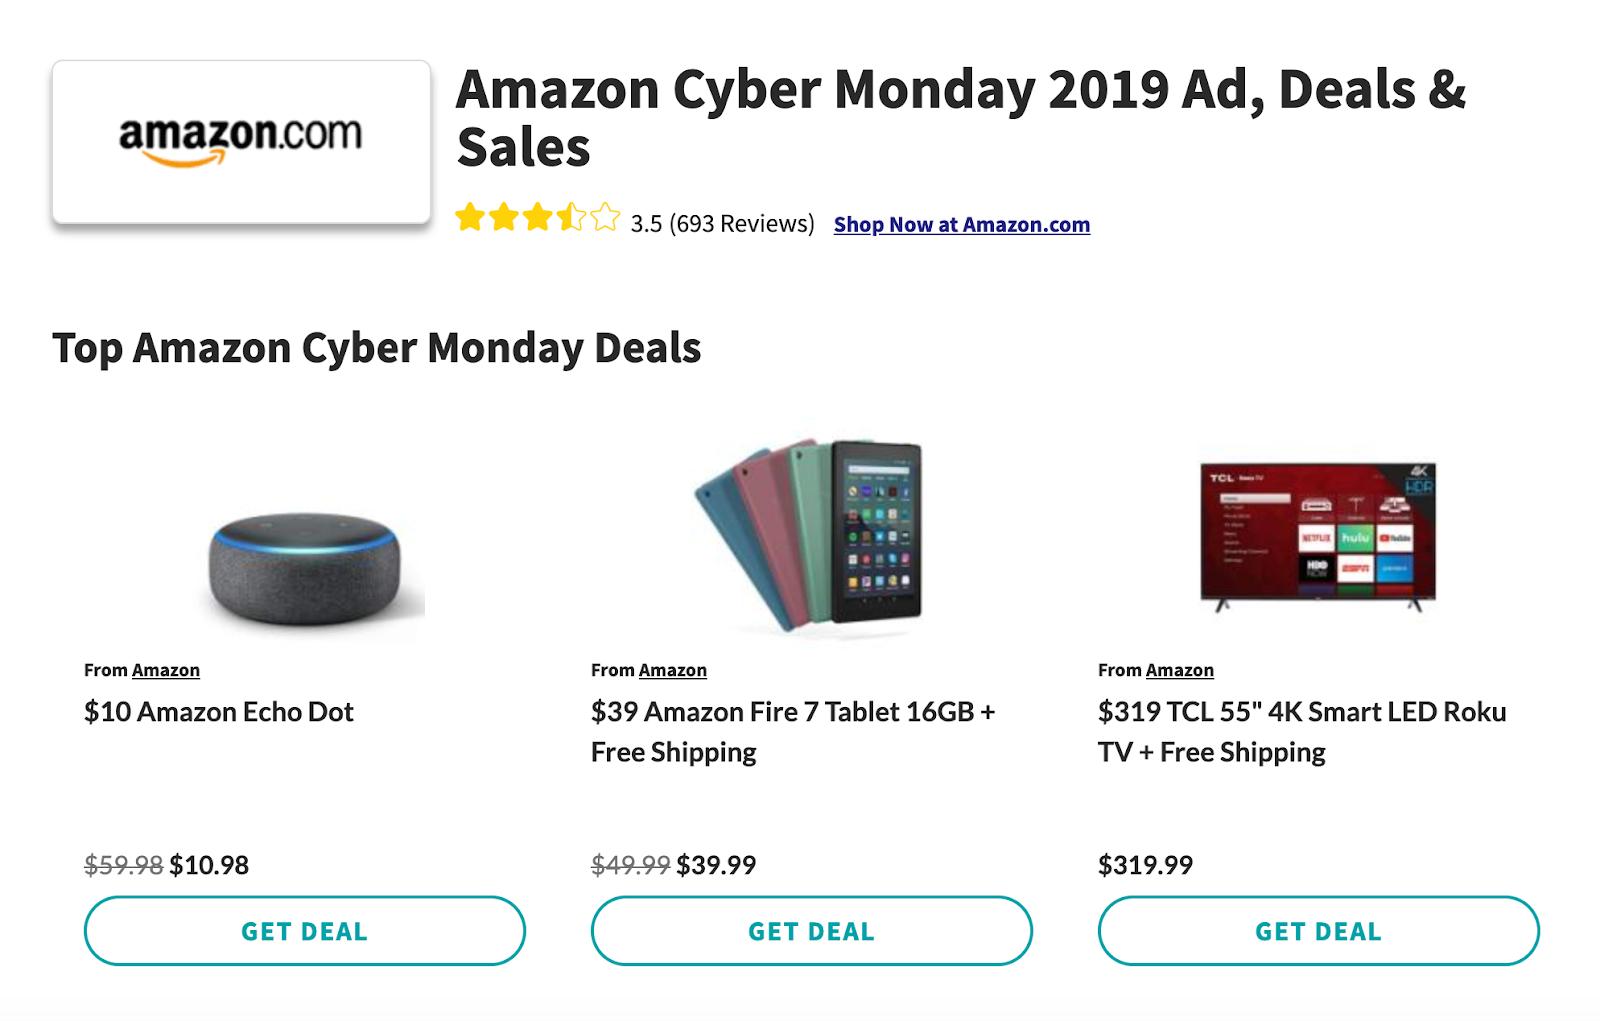 Amazon Cyber Monday deals 2019